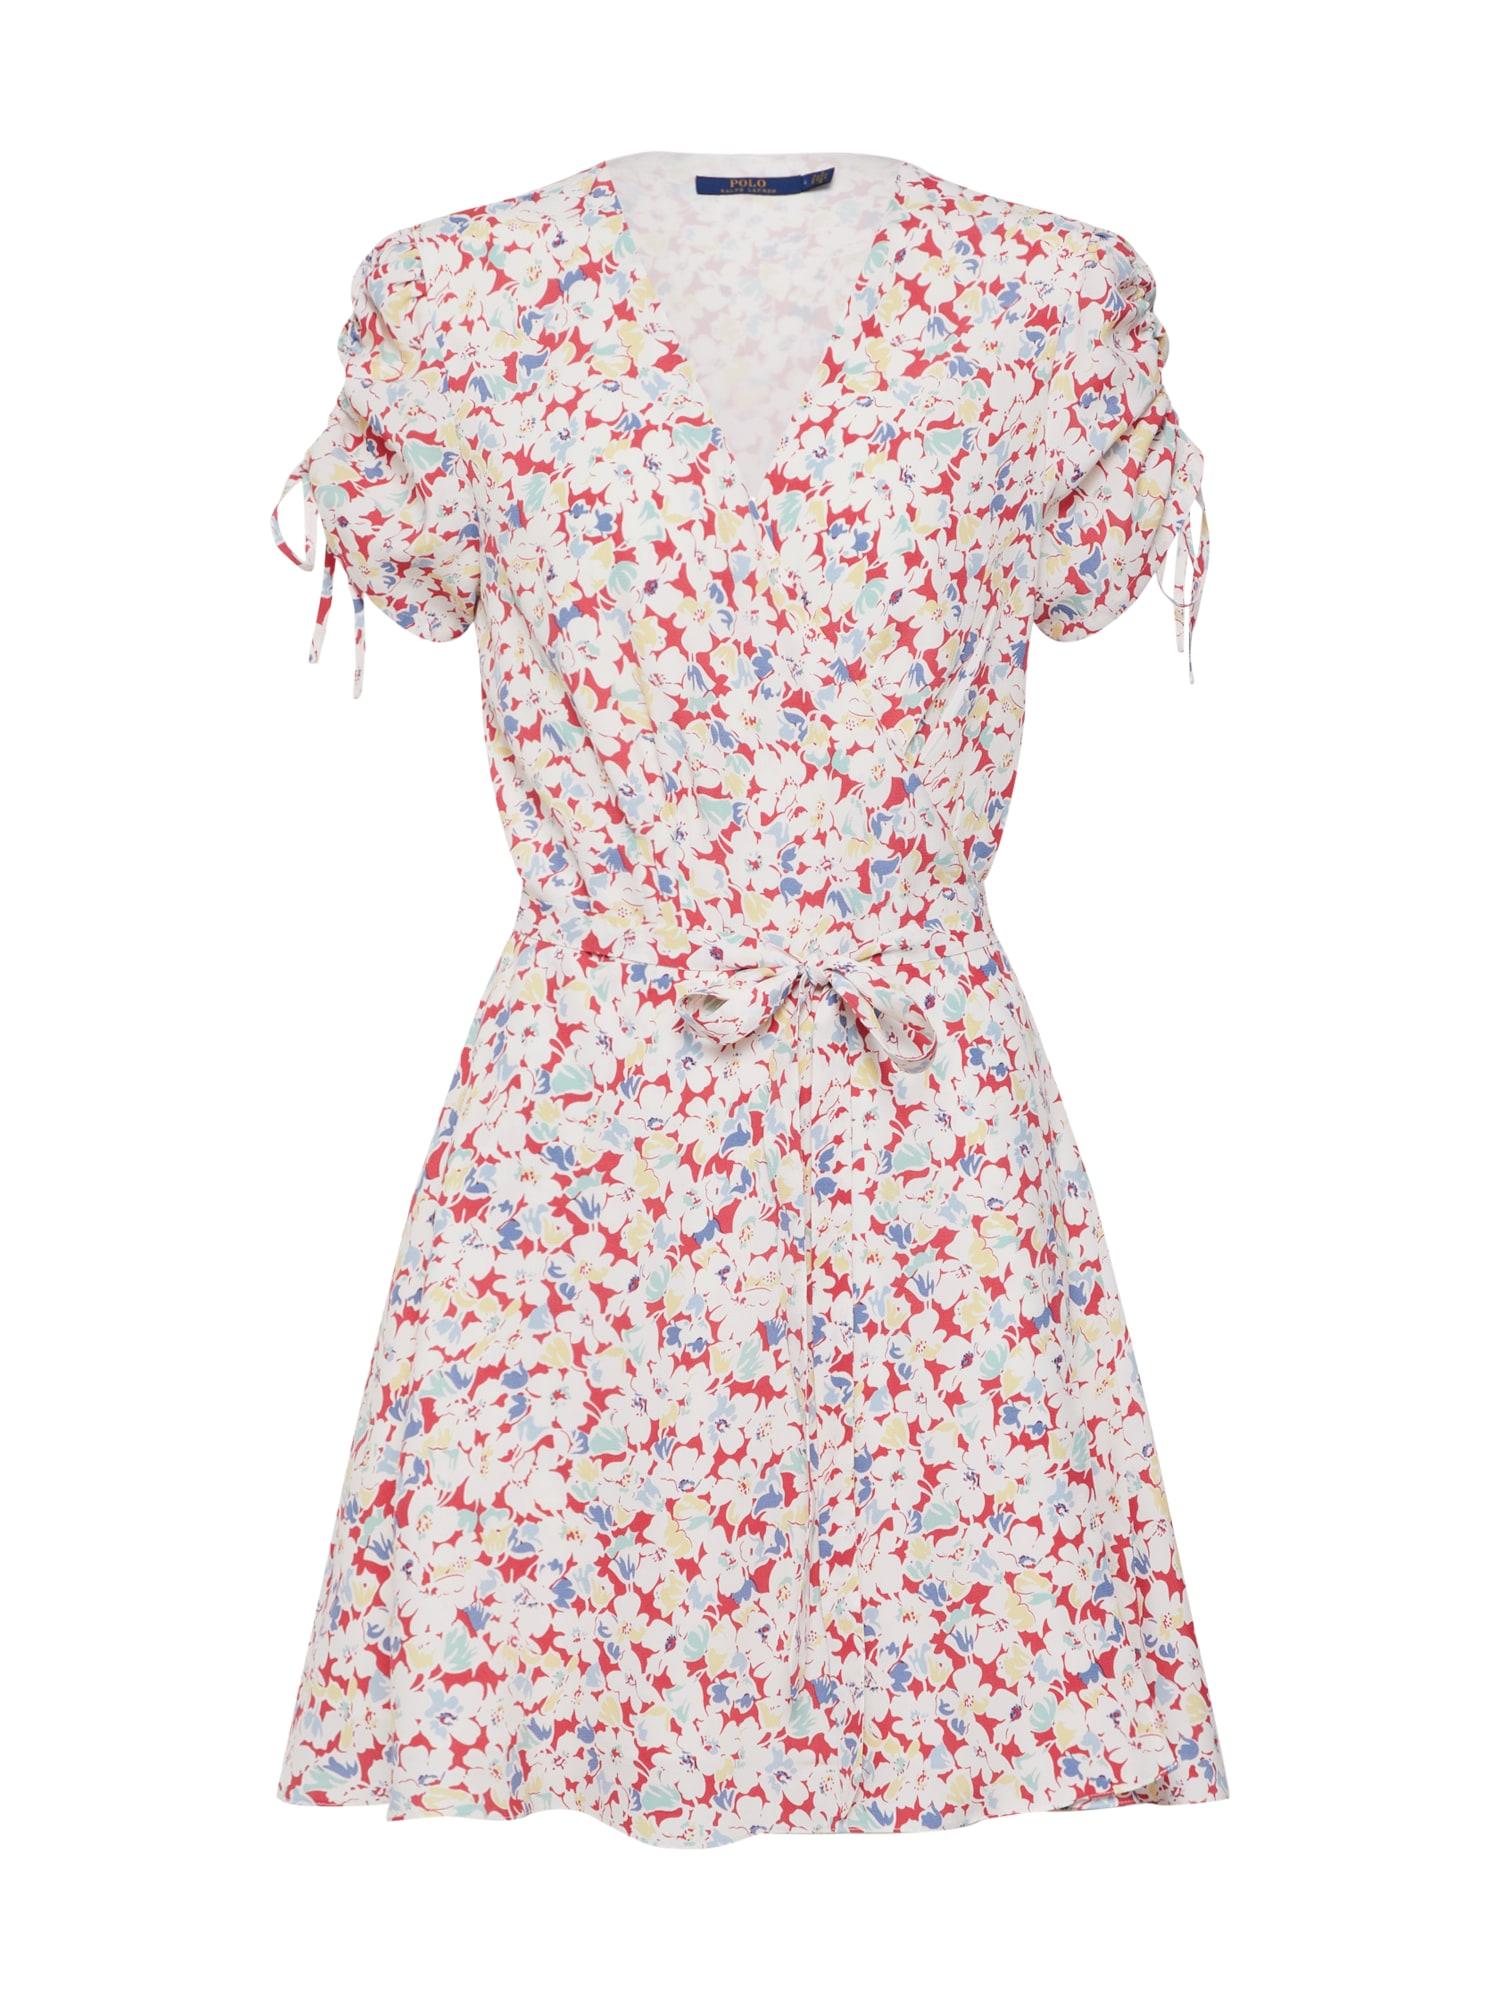 Letní šaty mix barev POLO RALPH LAUREN